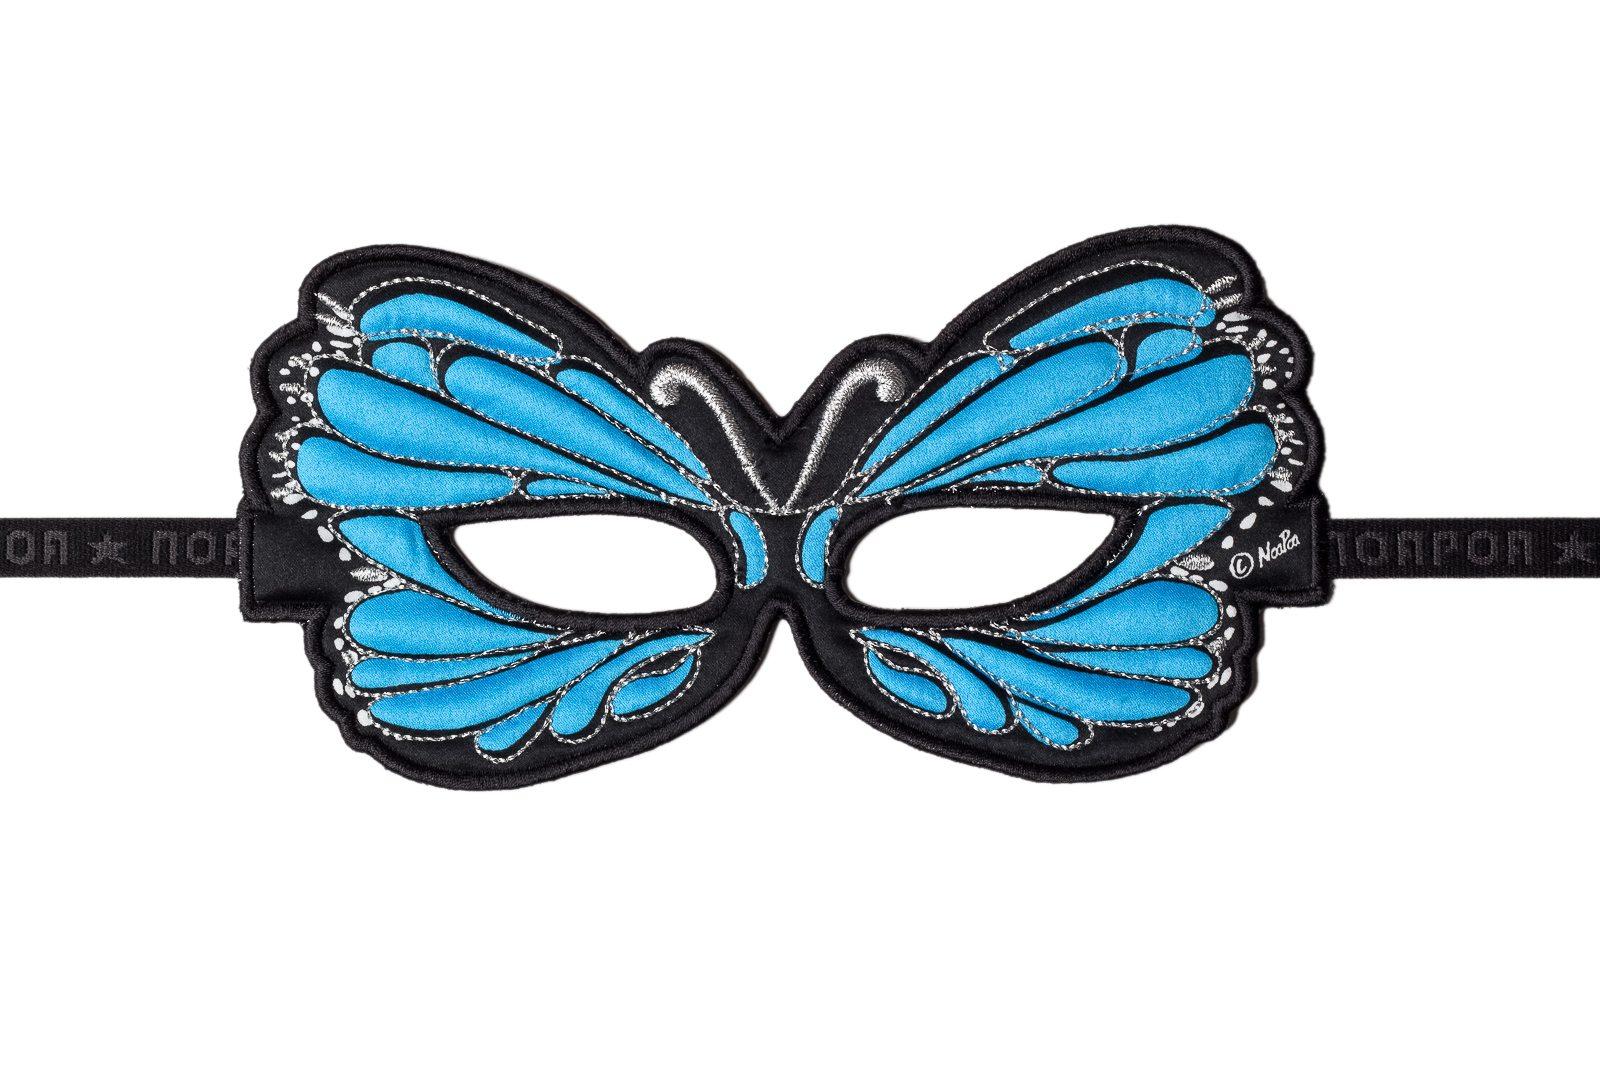 butterfly blue fabric mask jasabyn. Black Bedroom Furniture Sets. Home Design Ideas